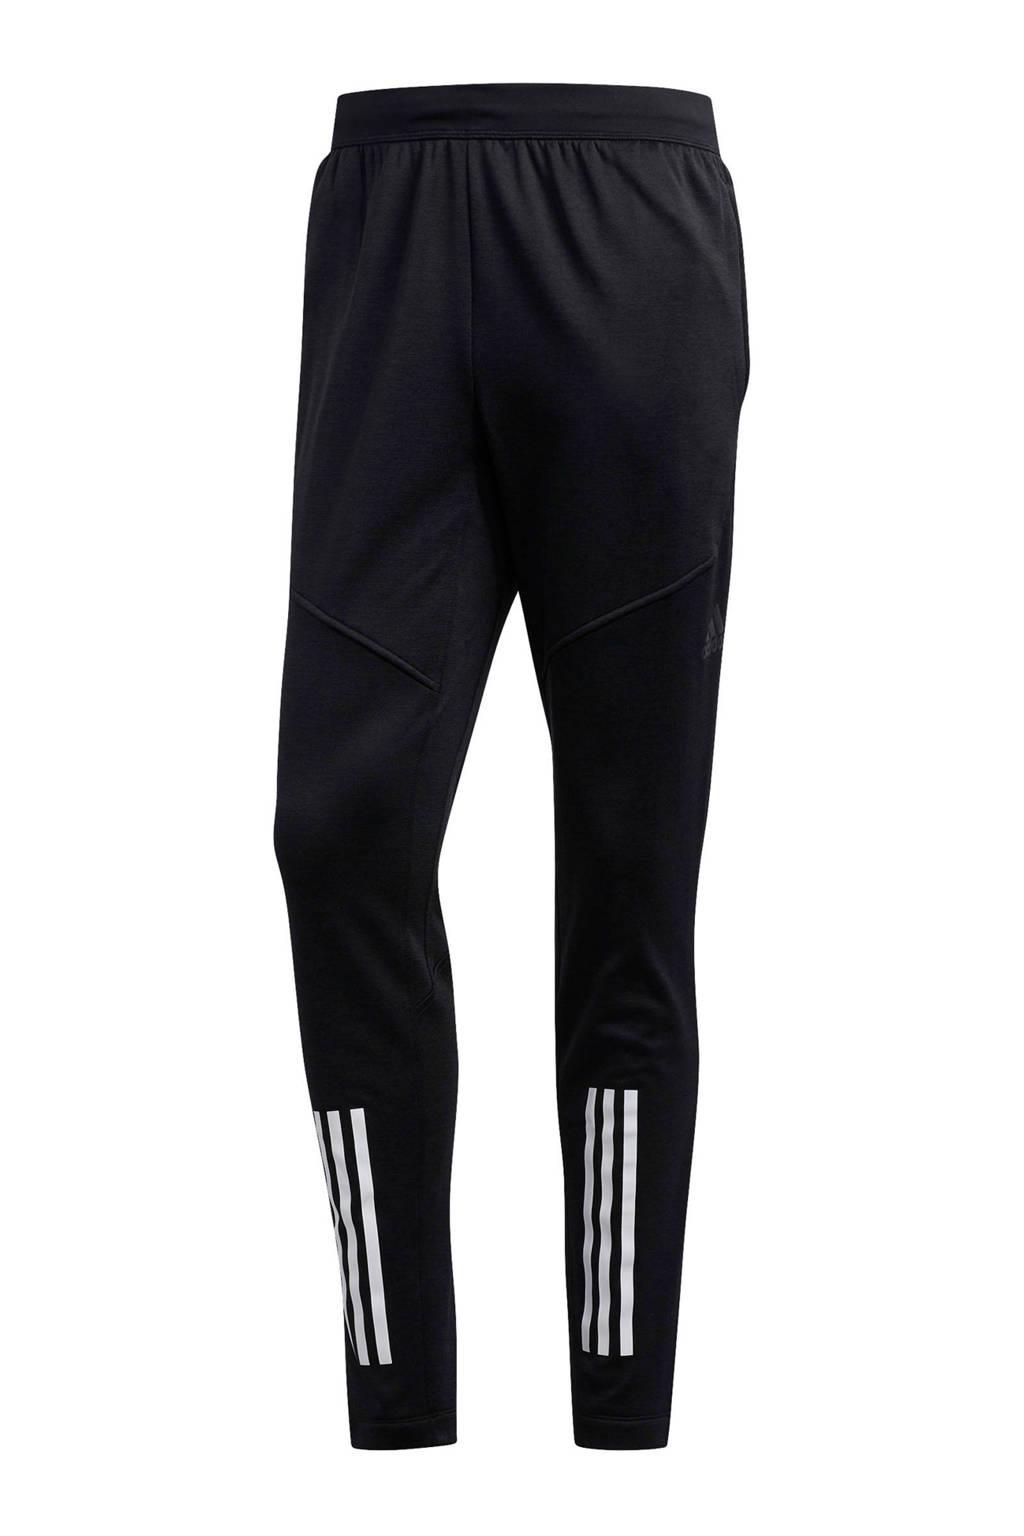 adidas performance   sportbroek, Zwart/wit